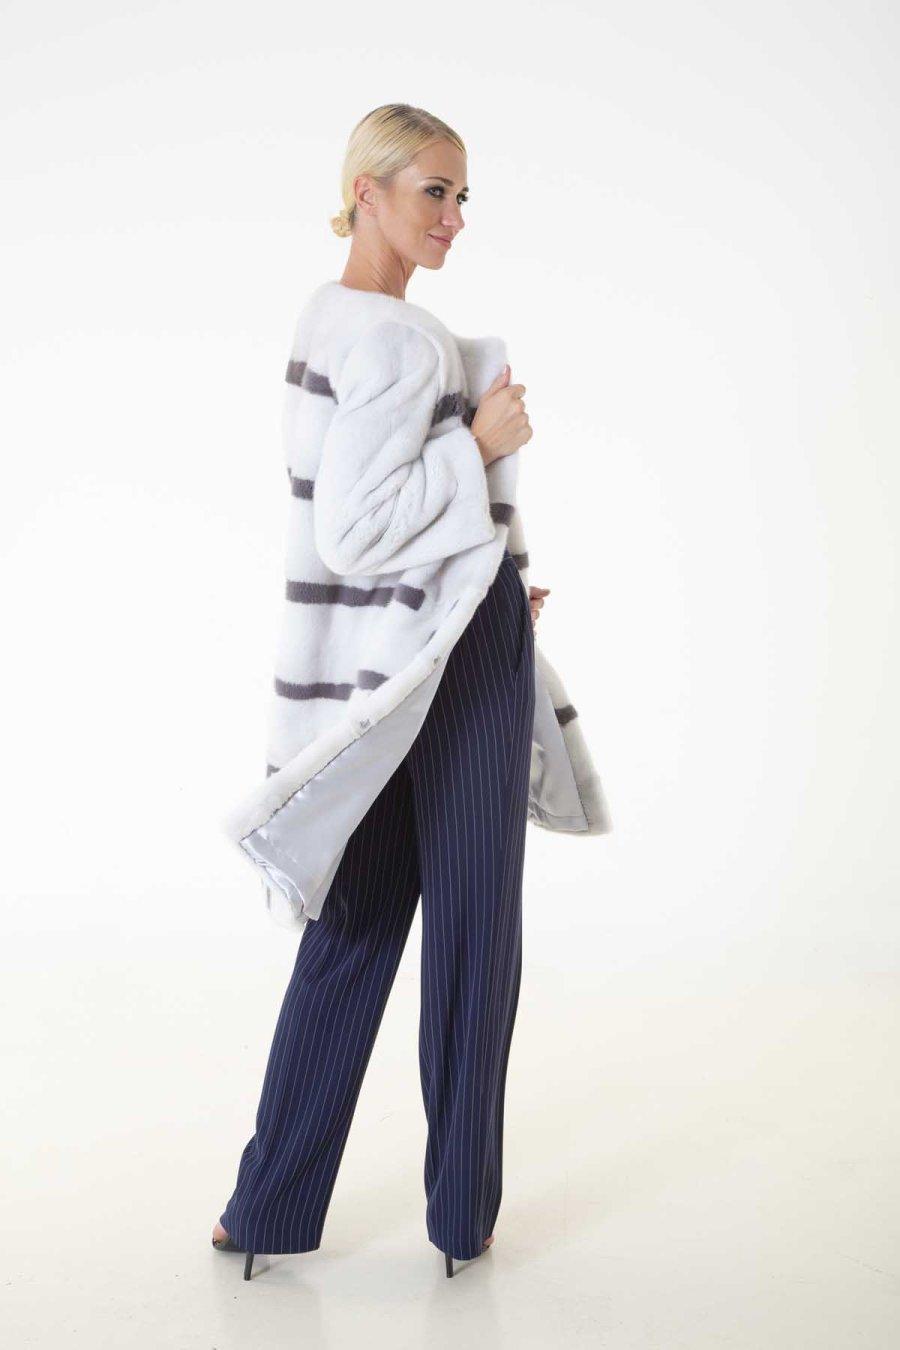 Violet Male Mink Jacket | Sarigianni Furs